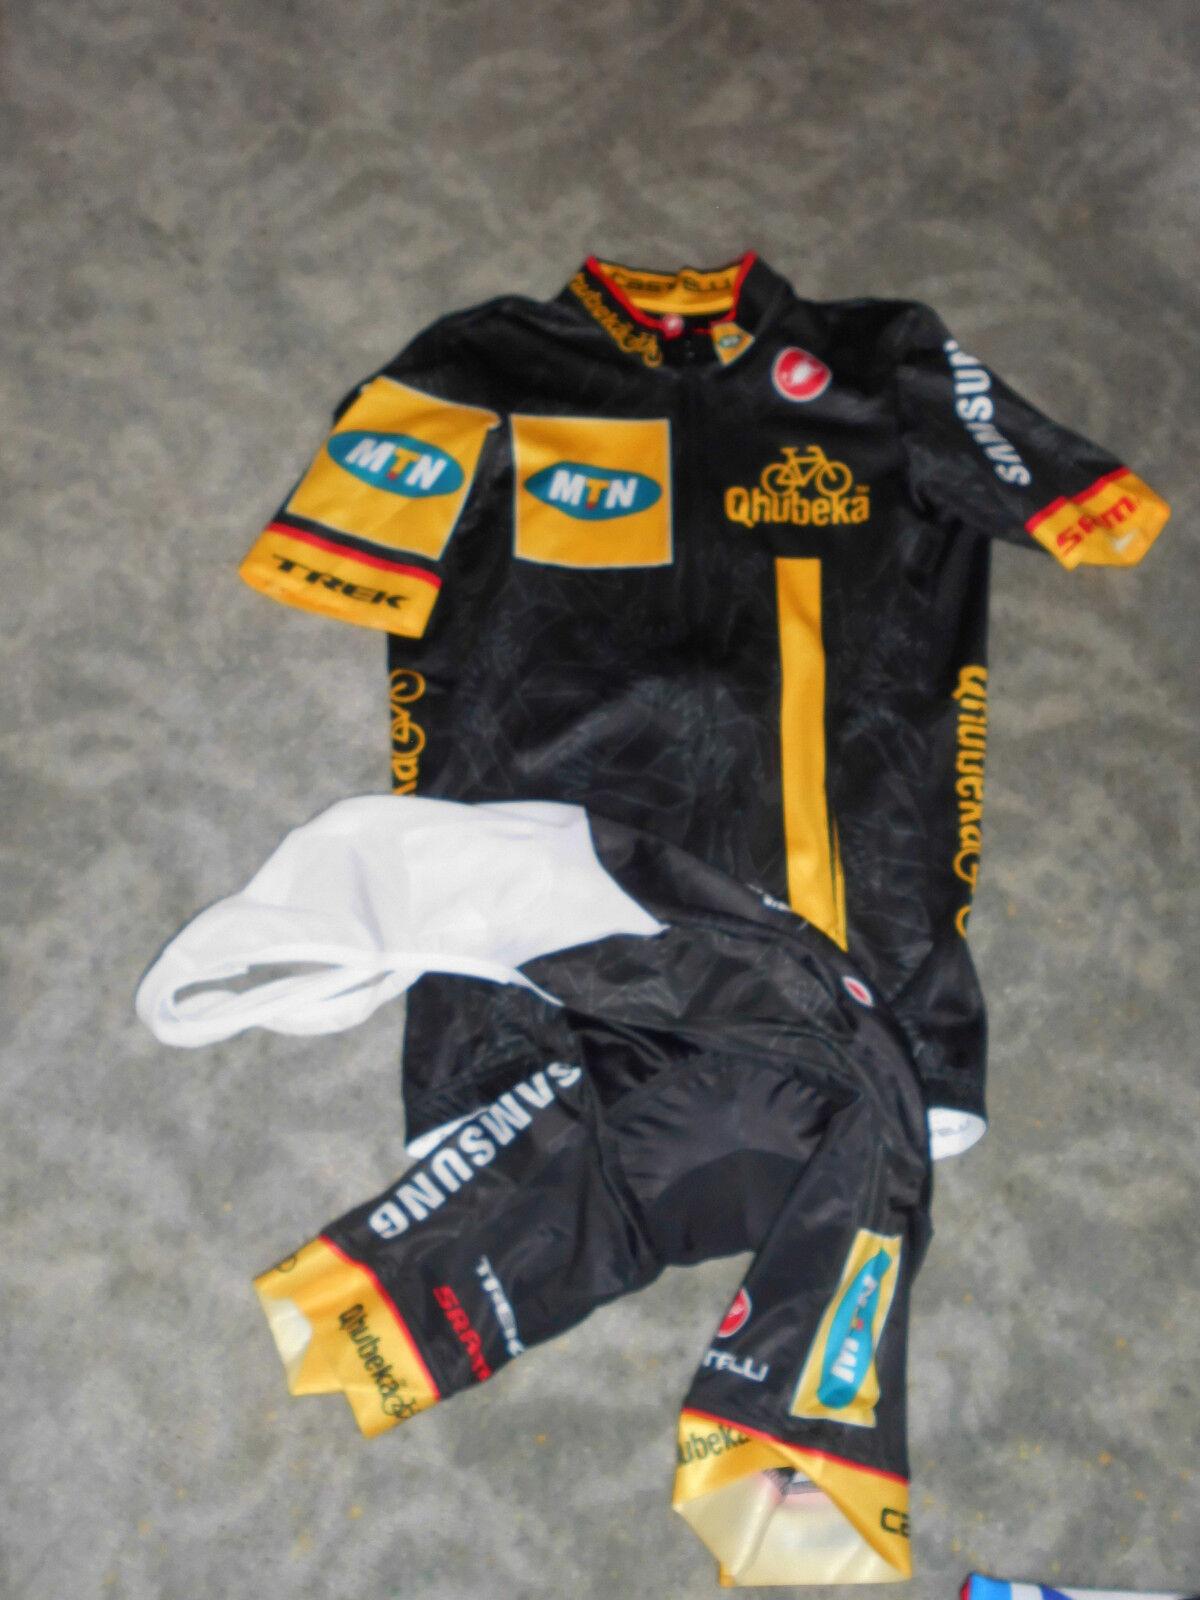 Original Castelli equipo MTN Qhubeka set camiseta + pantalones